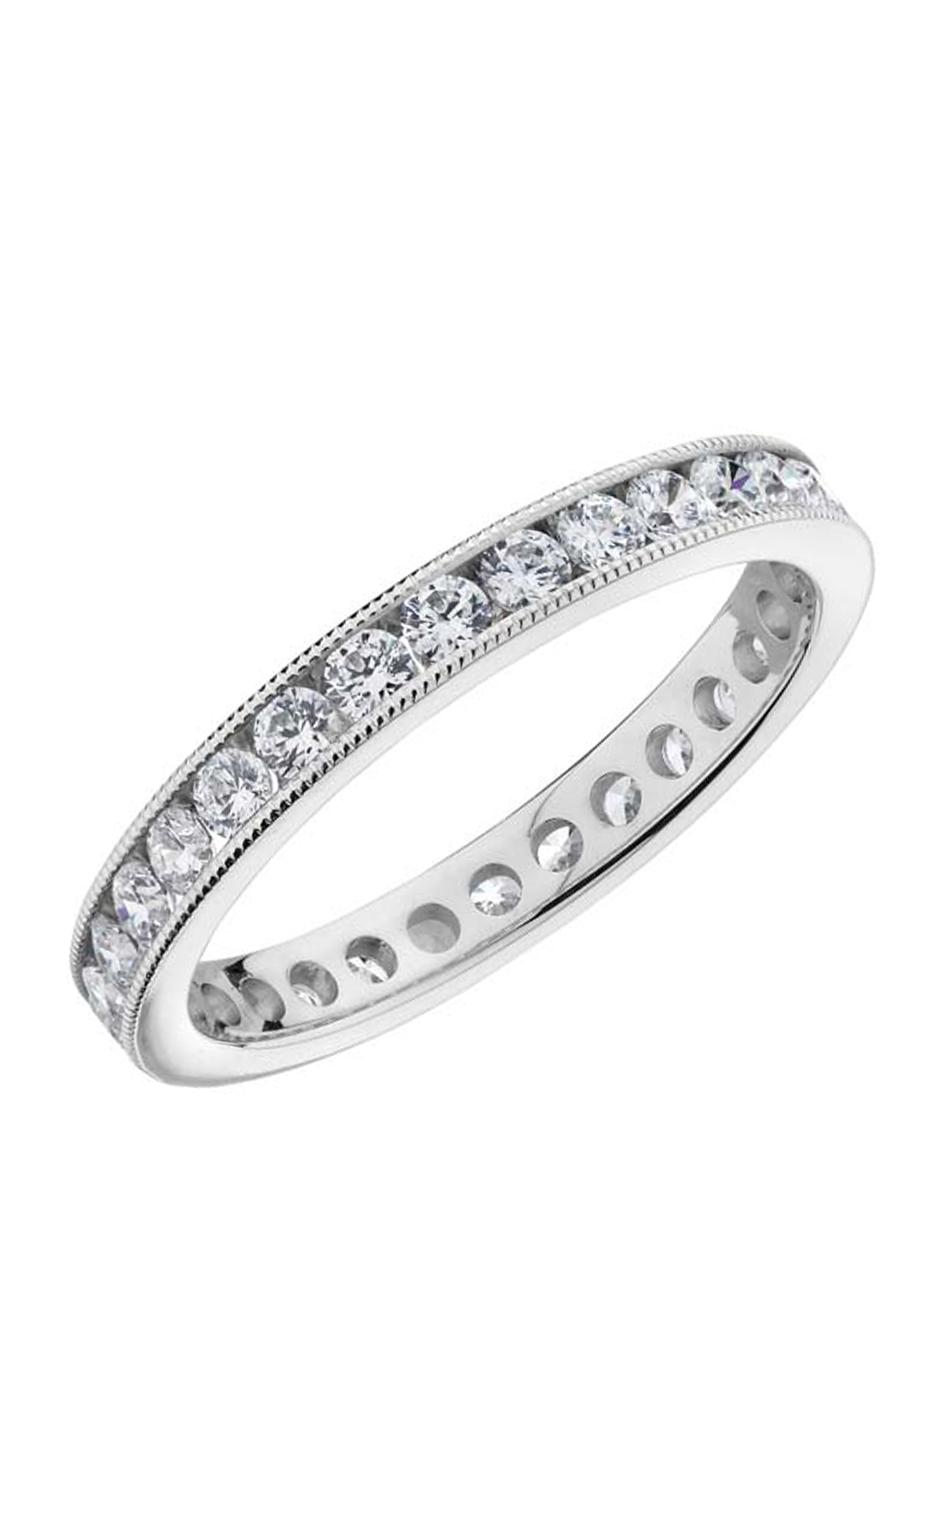 Vibhor Wedding Bands R0444 product image